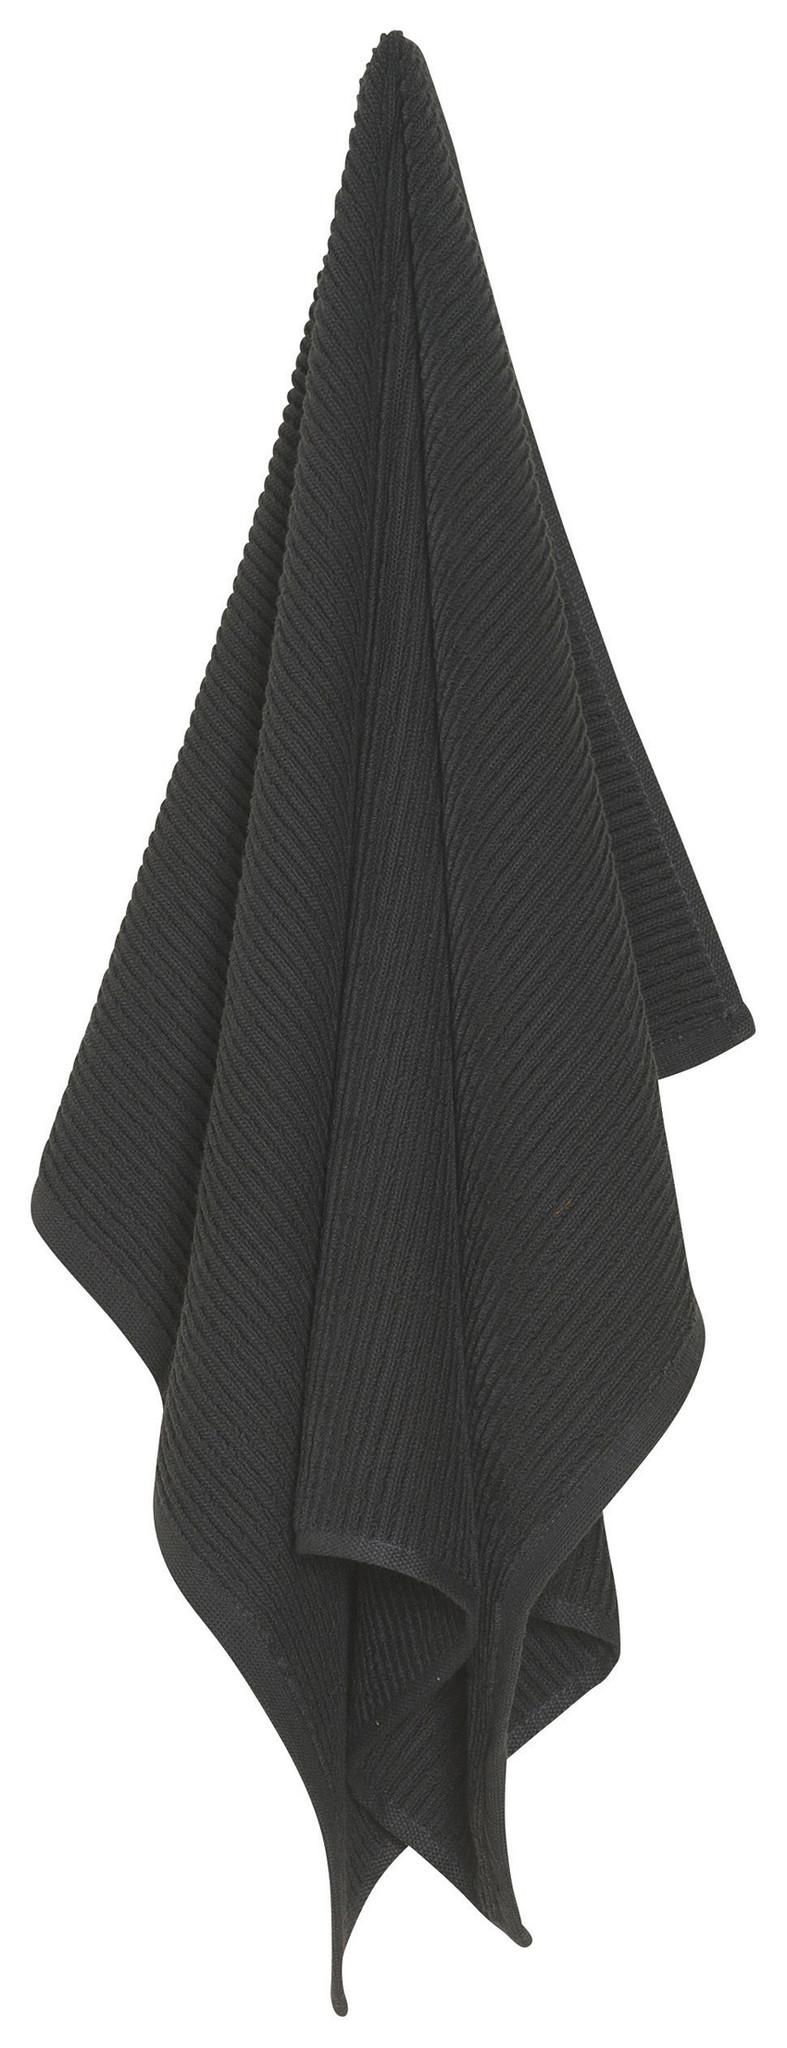 Now Designs Ripple Dish Towel - Black